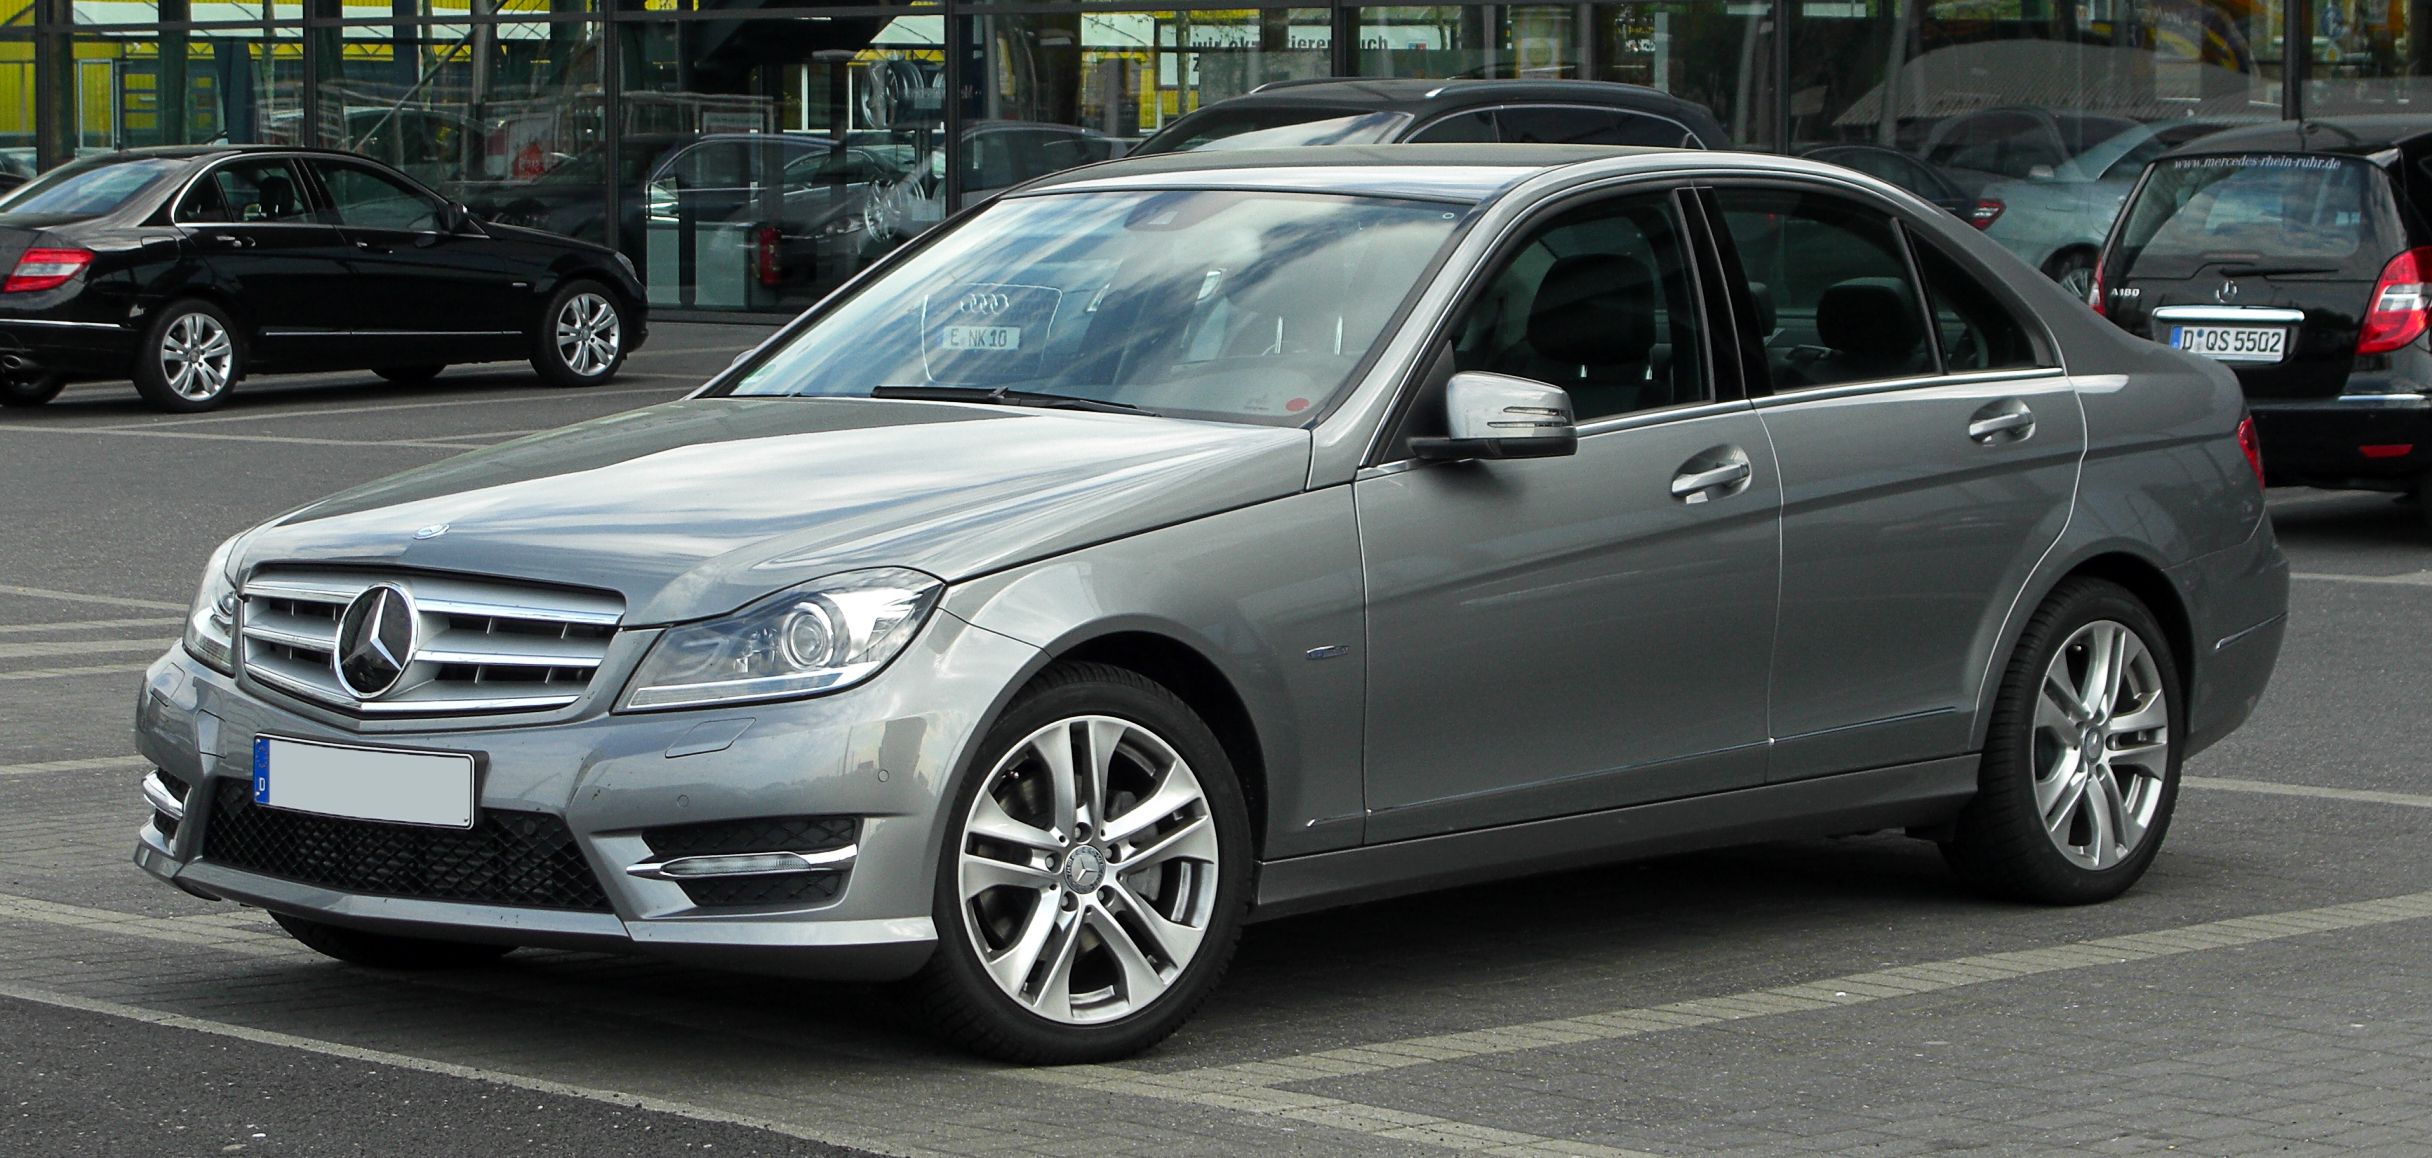 Mercedes benz c 220 cdi blueefficiency technical details for Mercedes benz performance parts